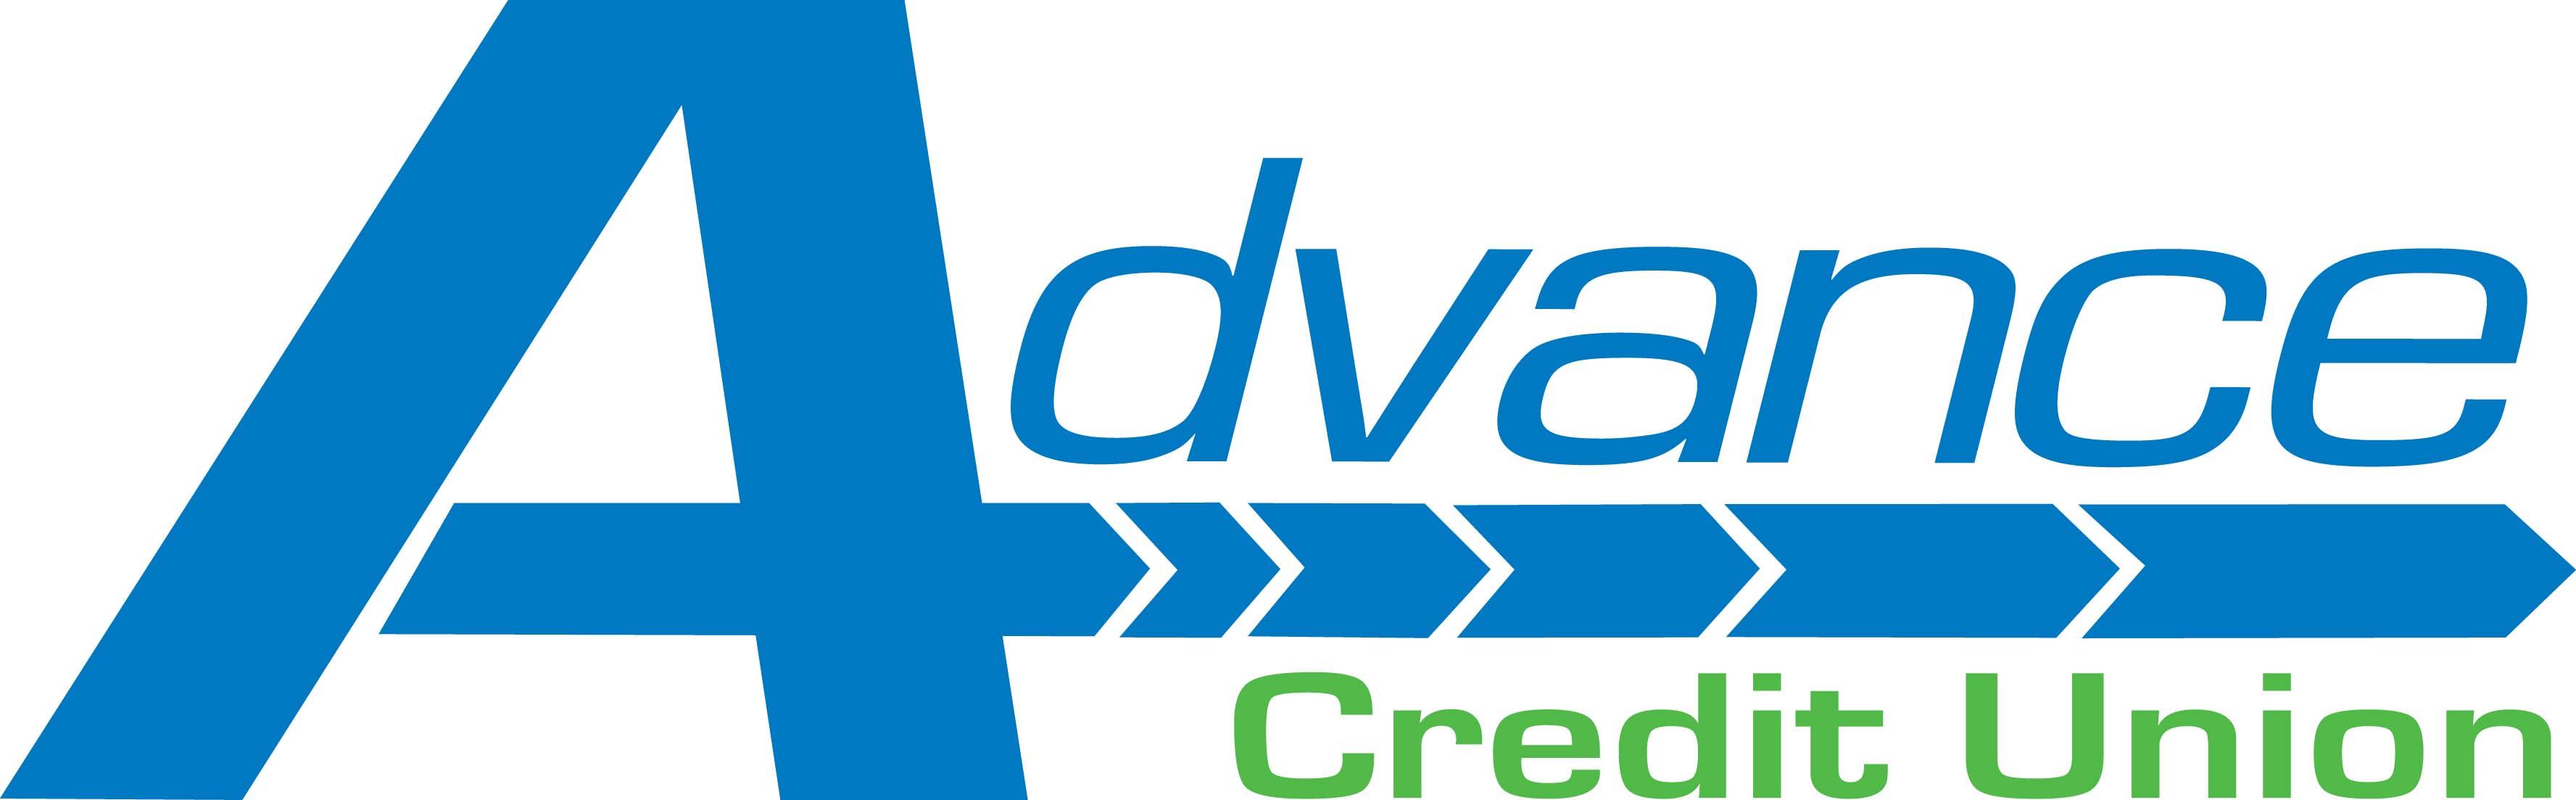 Advance Credit Union Ltd